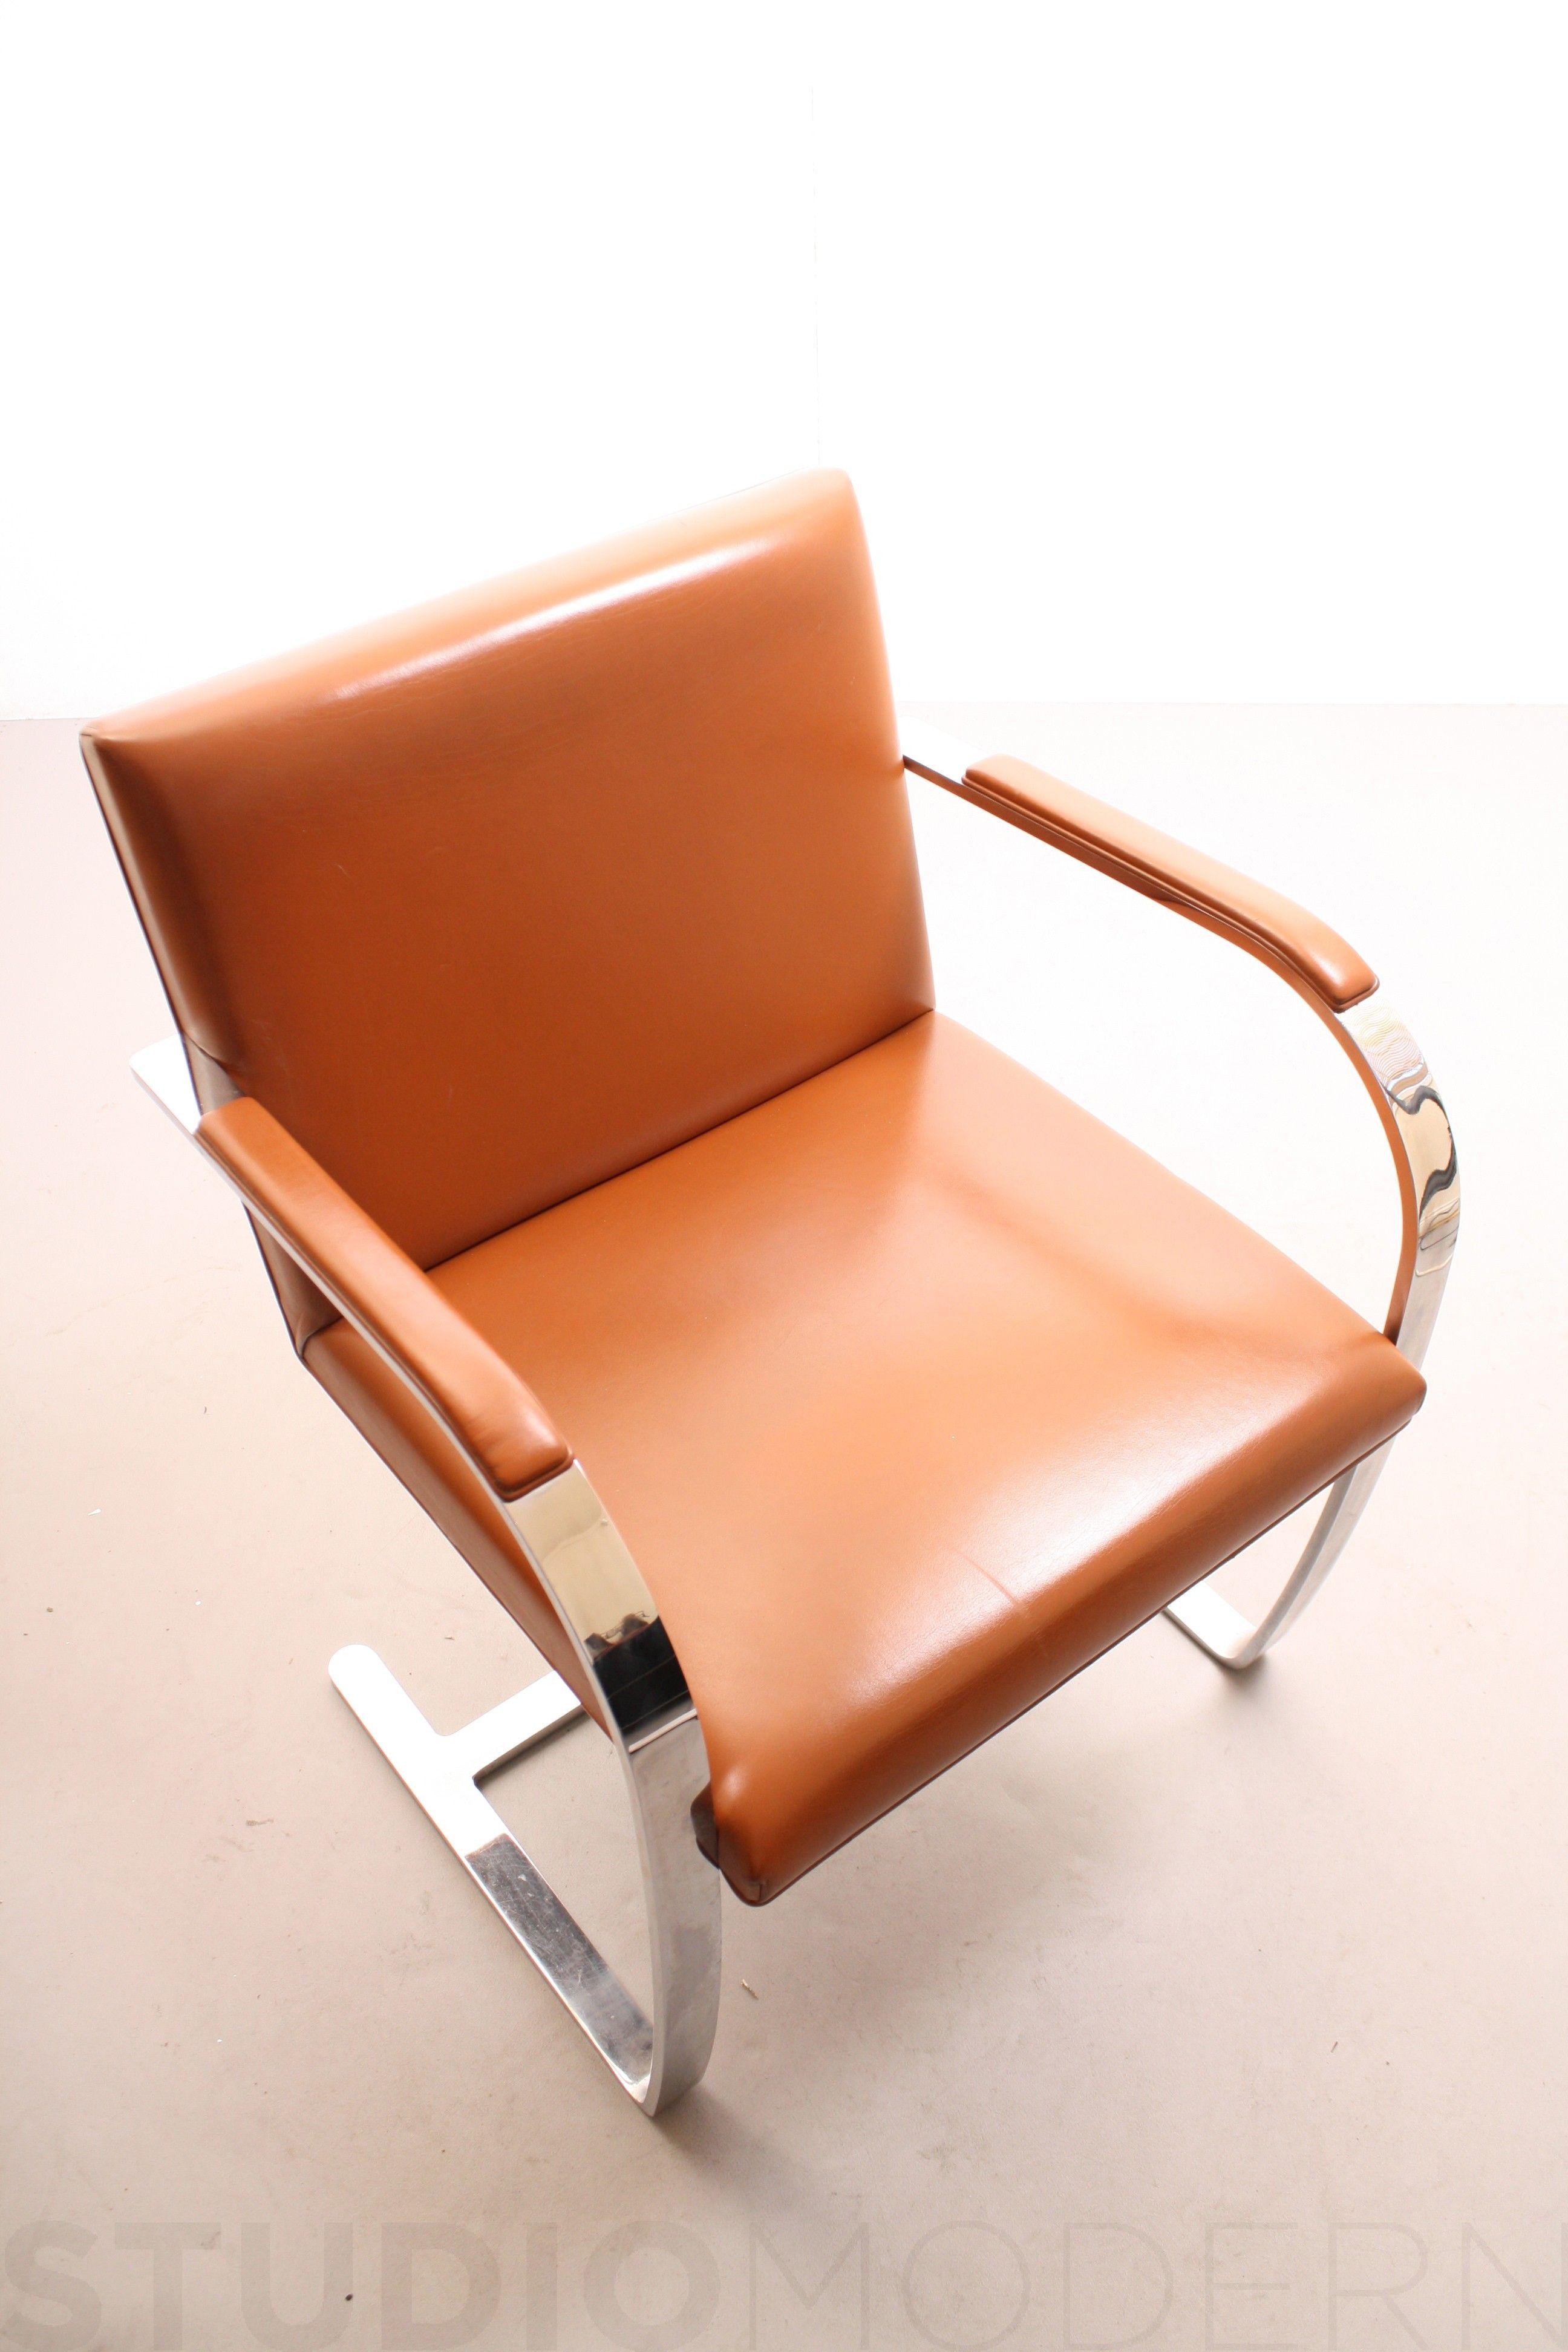 Knoll Van Der Rohe Brno Chair καρέκλες Pinterest Studio House